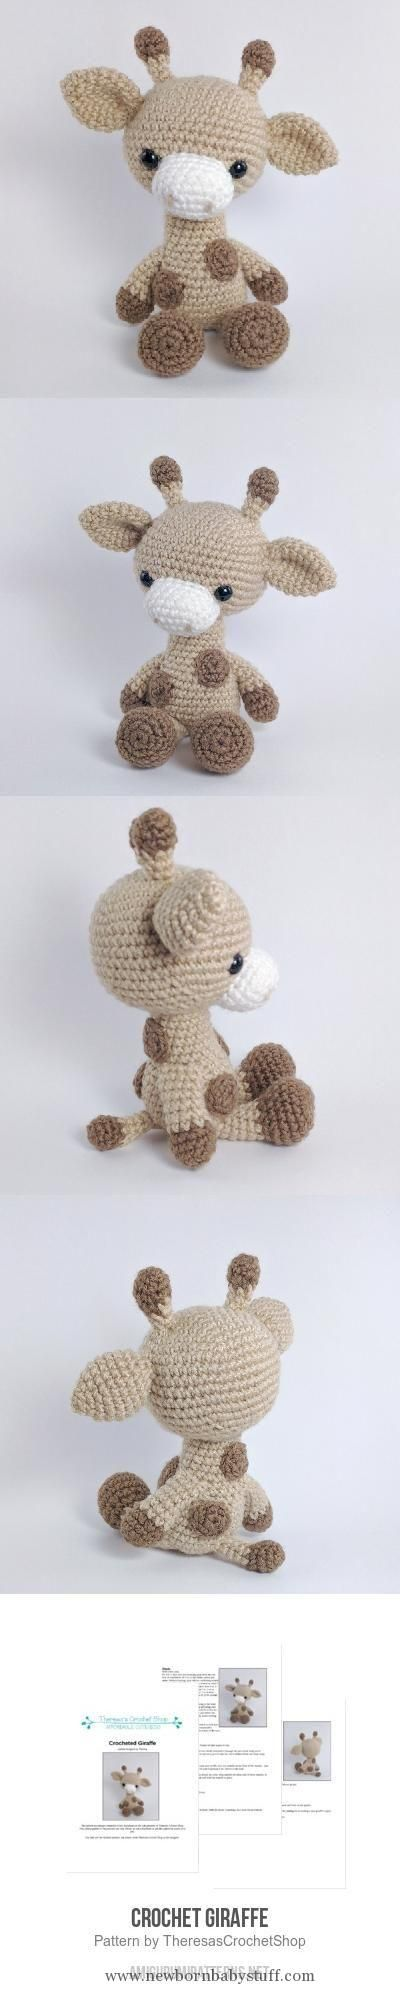 Baby Knitting Patterns Crochet Giraffe Amigurumi Pattern ...